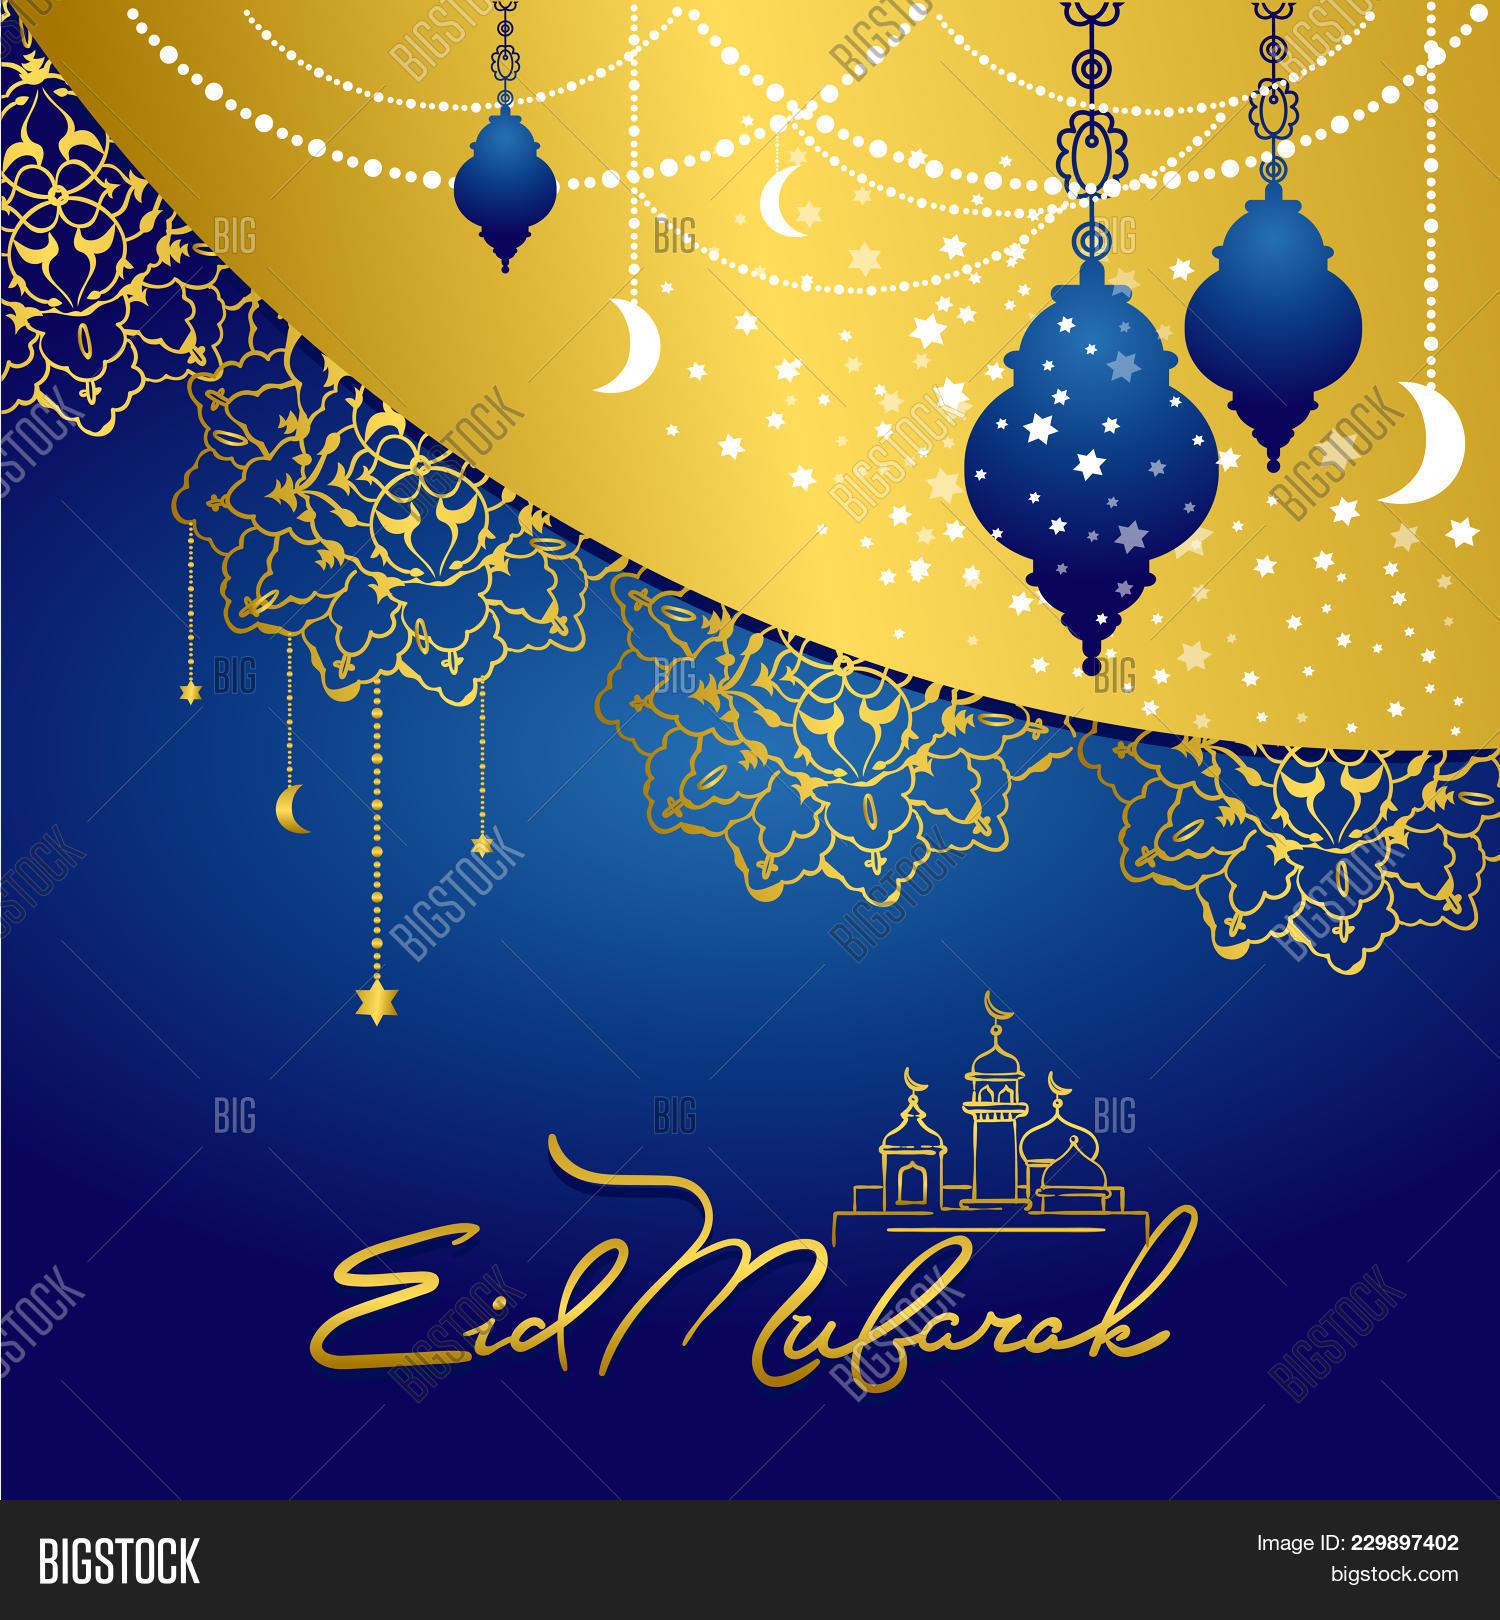 Eid mubarak greeting image photo free trial bigstock eid mubarak greeting card illustration muslim festival celebration poster islamic holiday poster w m4hsunfo